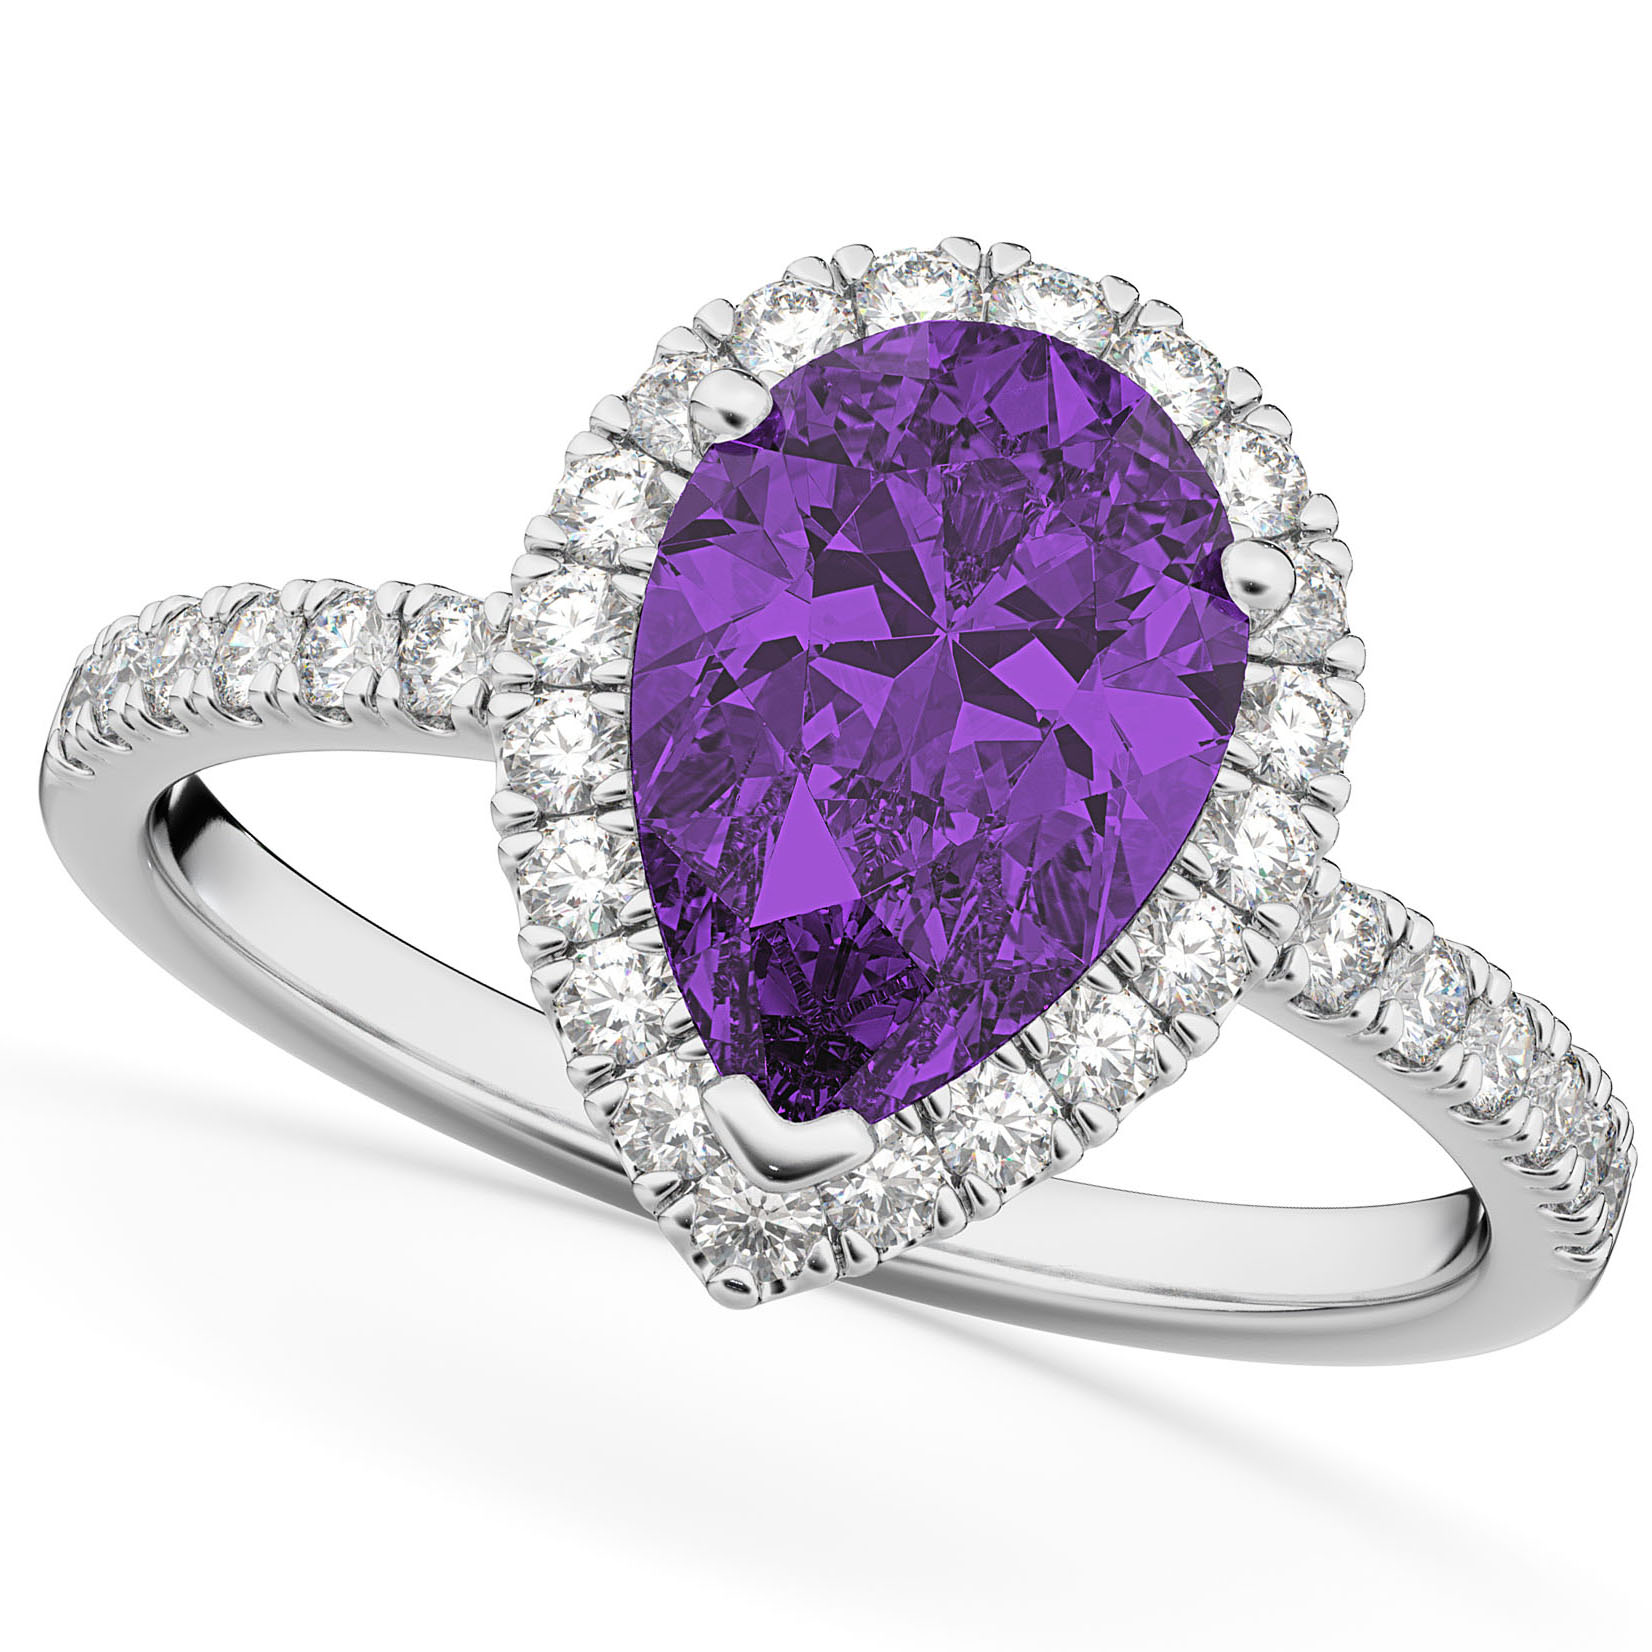 Pear Cut Halo Amethyst & Diamond Engagement Ring 14K White Gold 2.21ct